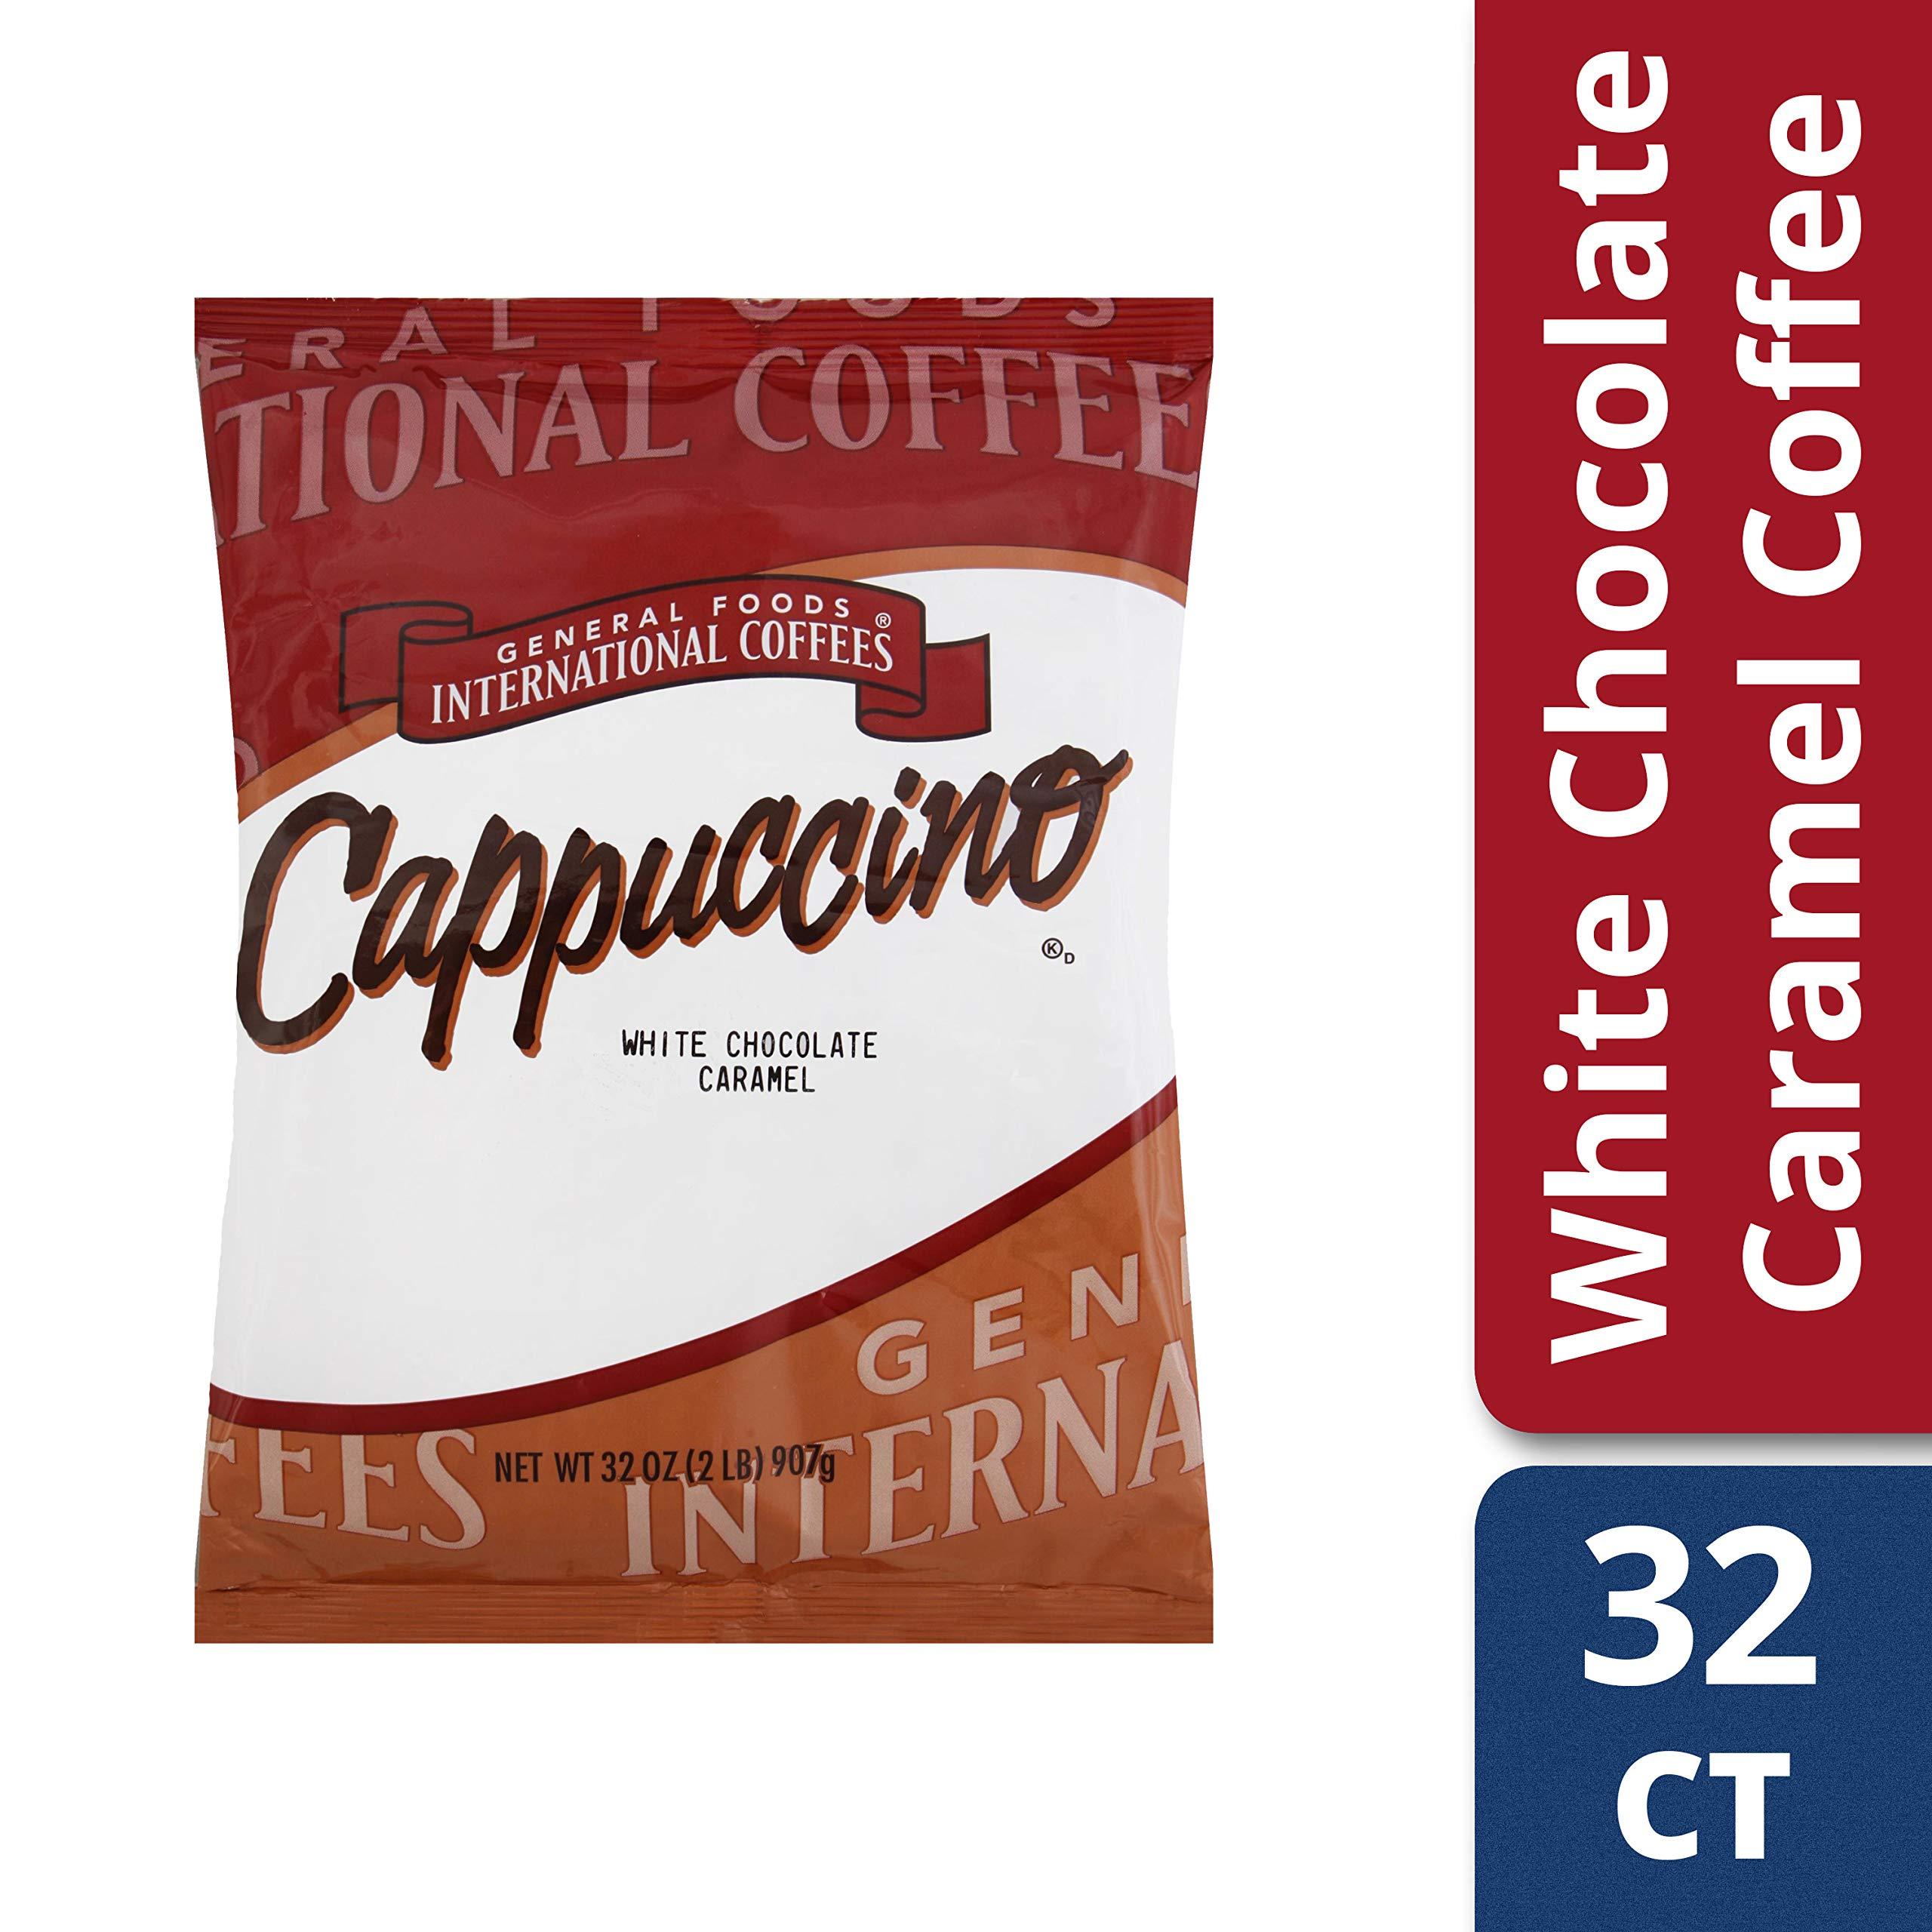 General Foods International White Chocolate Caramel Coffee Mix (2 lbs Jugs, Pack of 6) by General Foods International